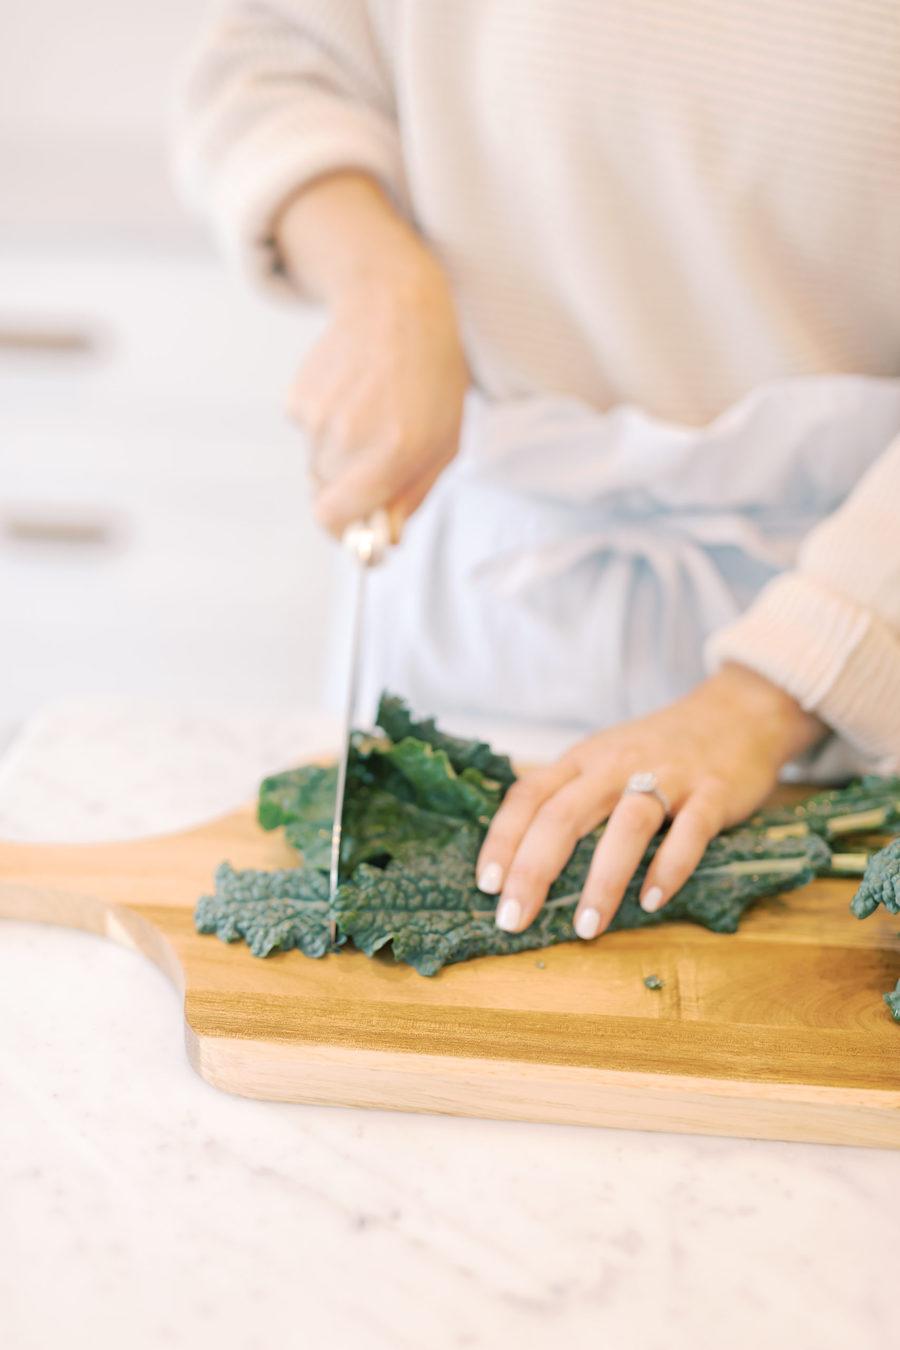 cooking recipe burnout